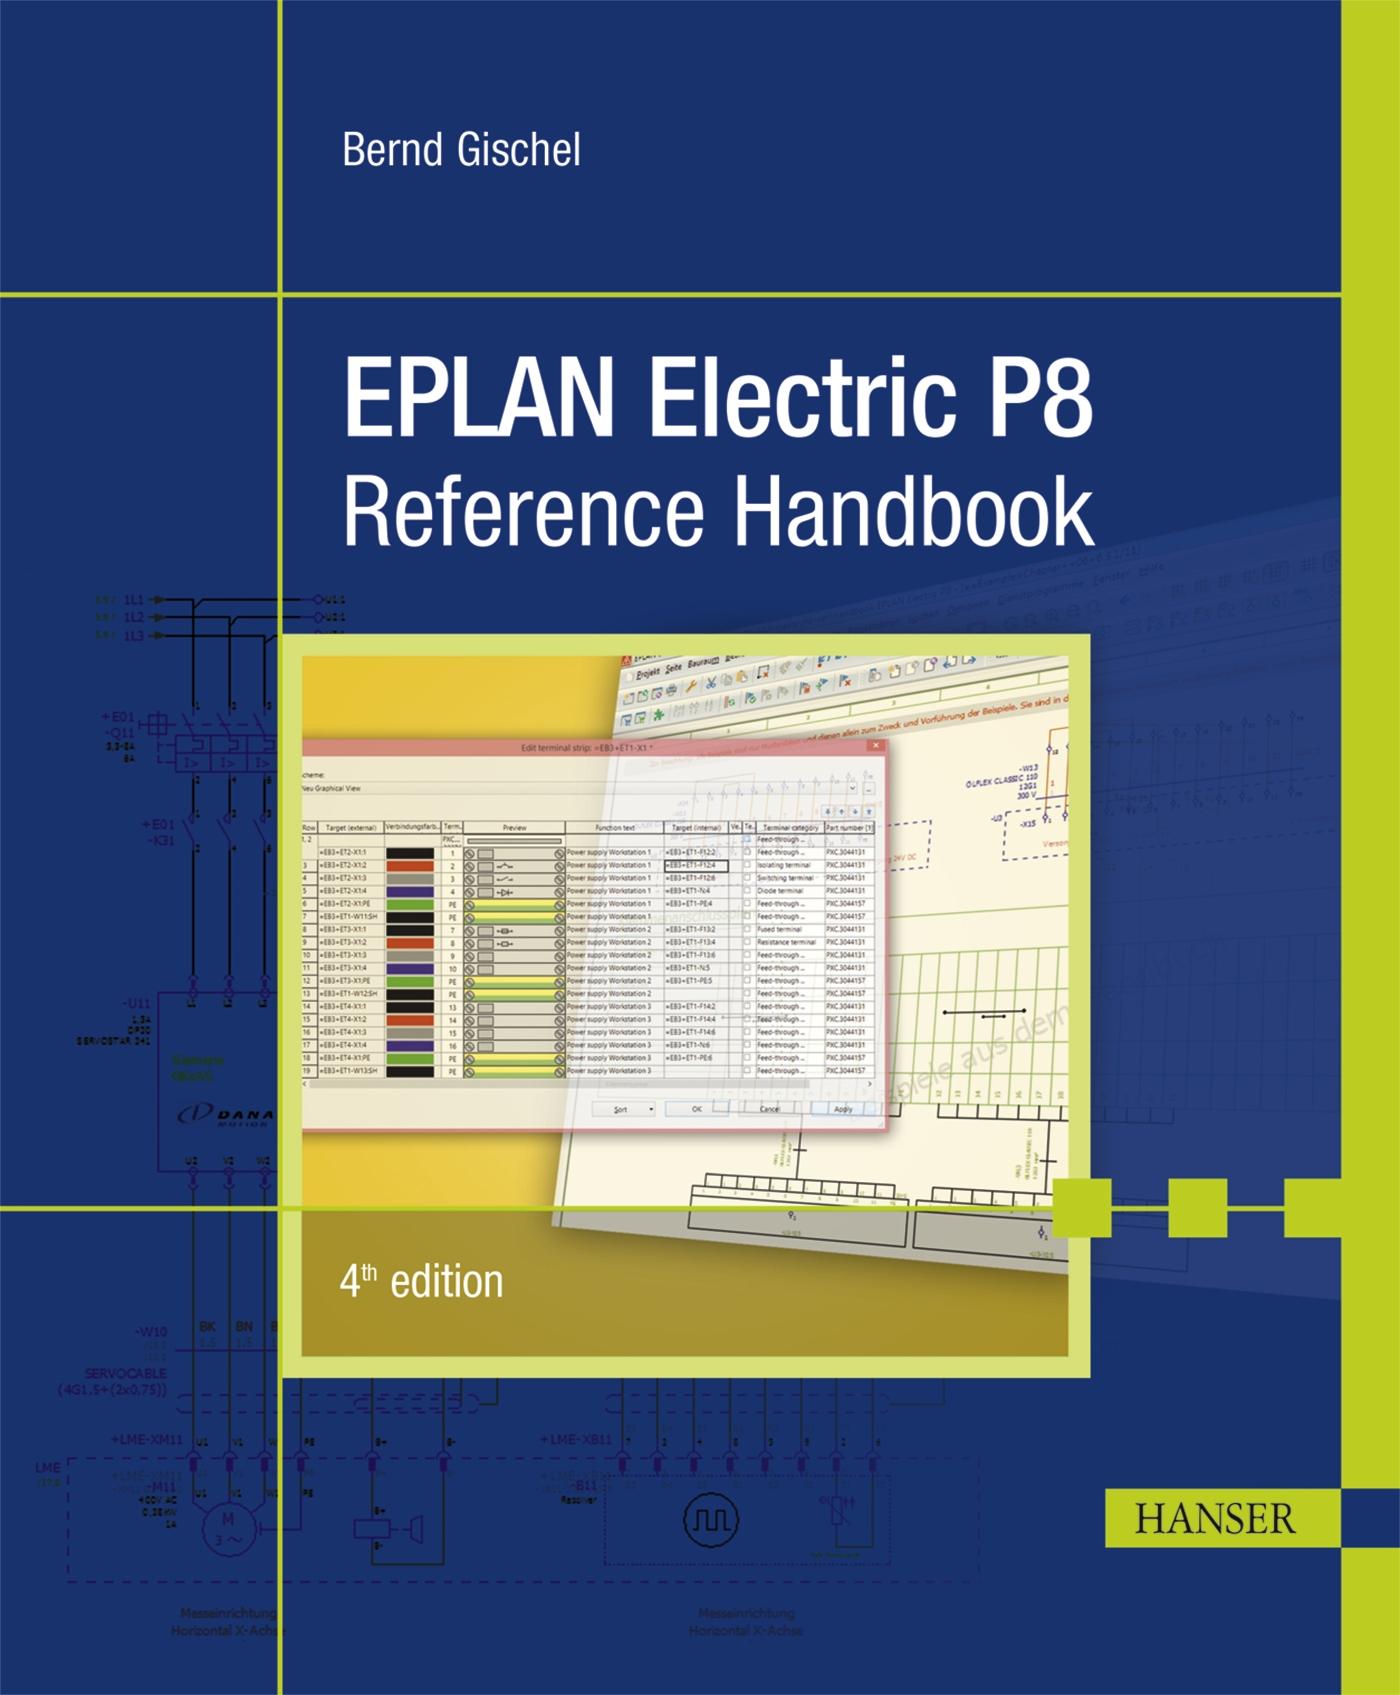 Eplan Electric P8 Reference Handbook 2nd Edition Pdf